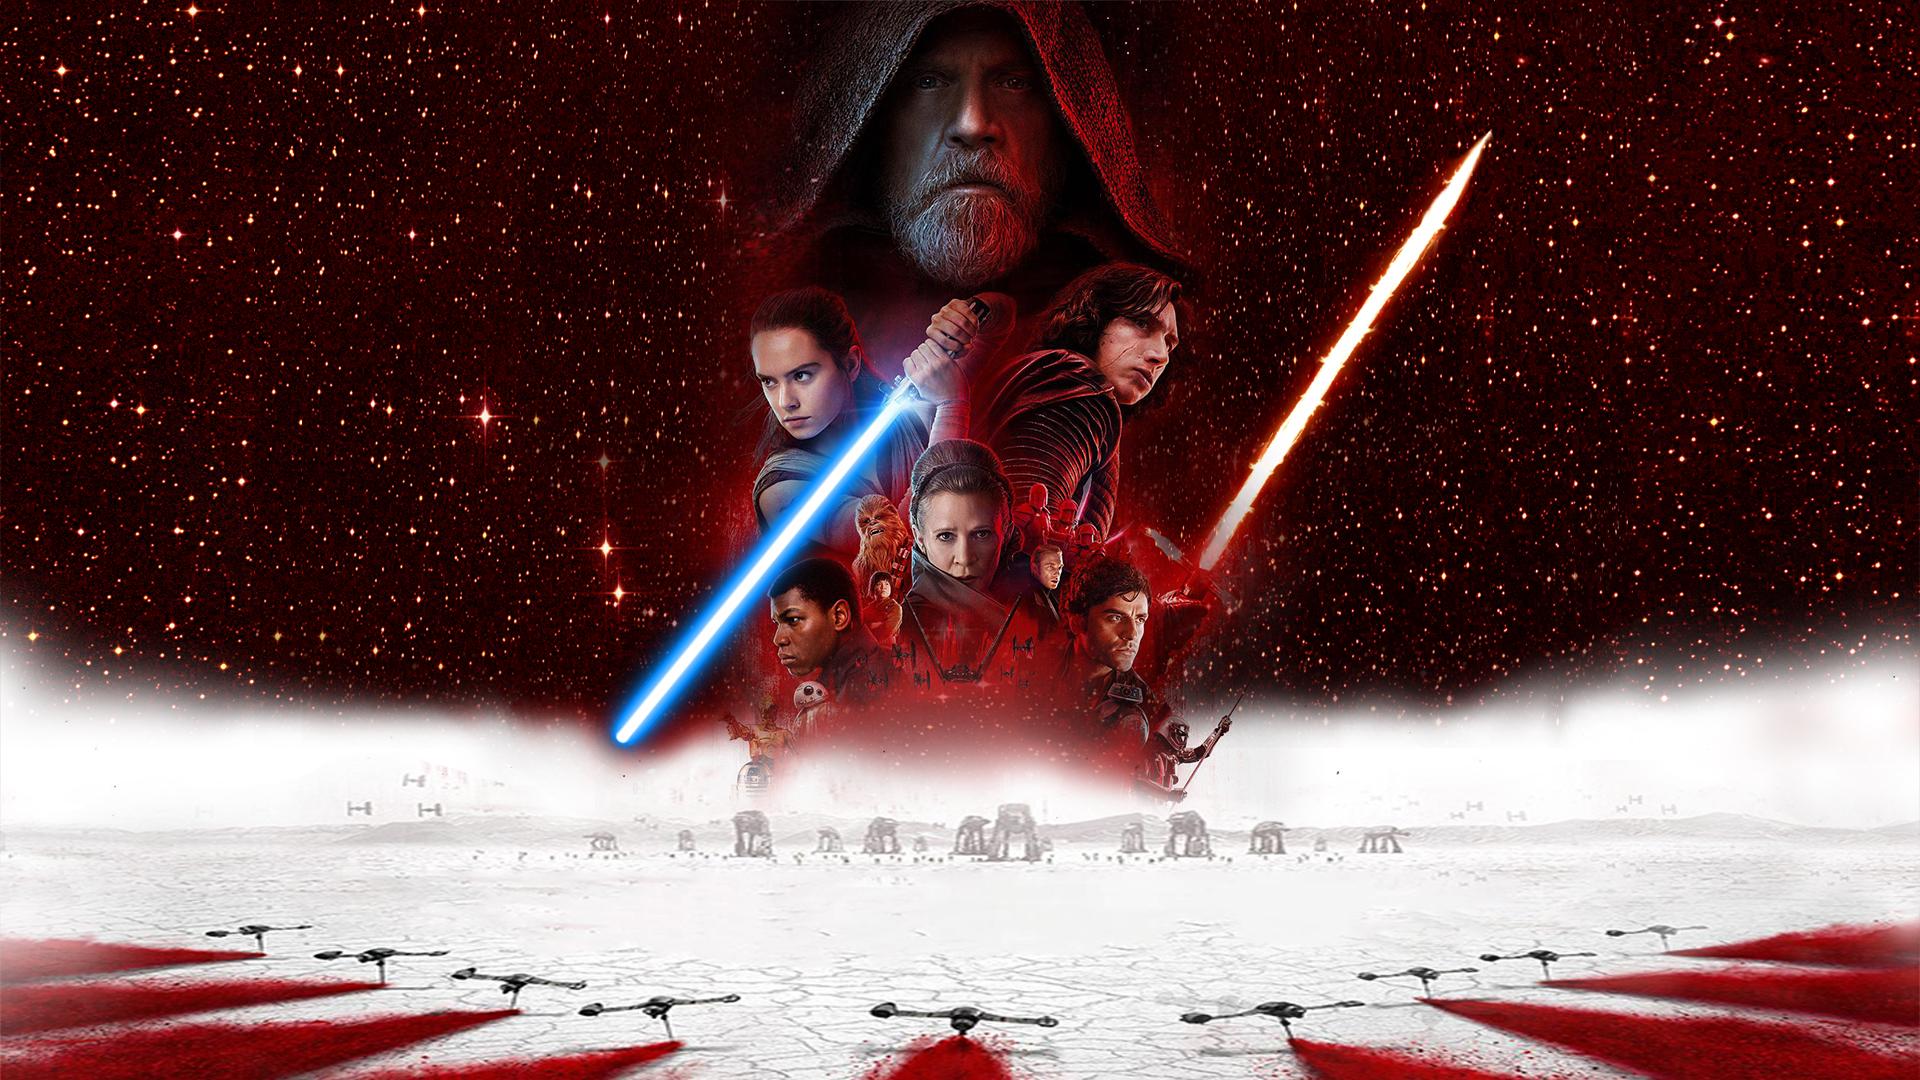 General 1920x1080 Star Wars: The Last Jedi Rey (from Star Wars) Luke Skywalker Princess Leia Kylo Ren lightsaber movies Jedi Star Wars Heroes Star Wars Villains